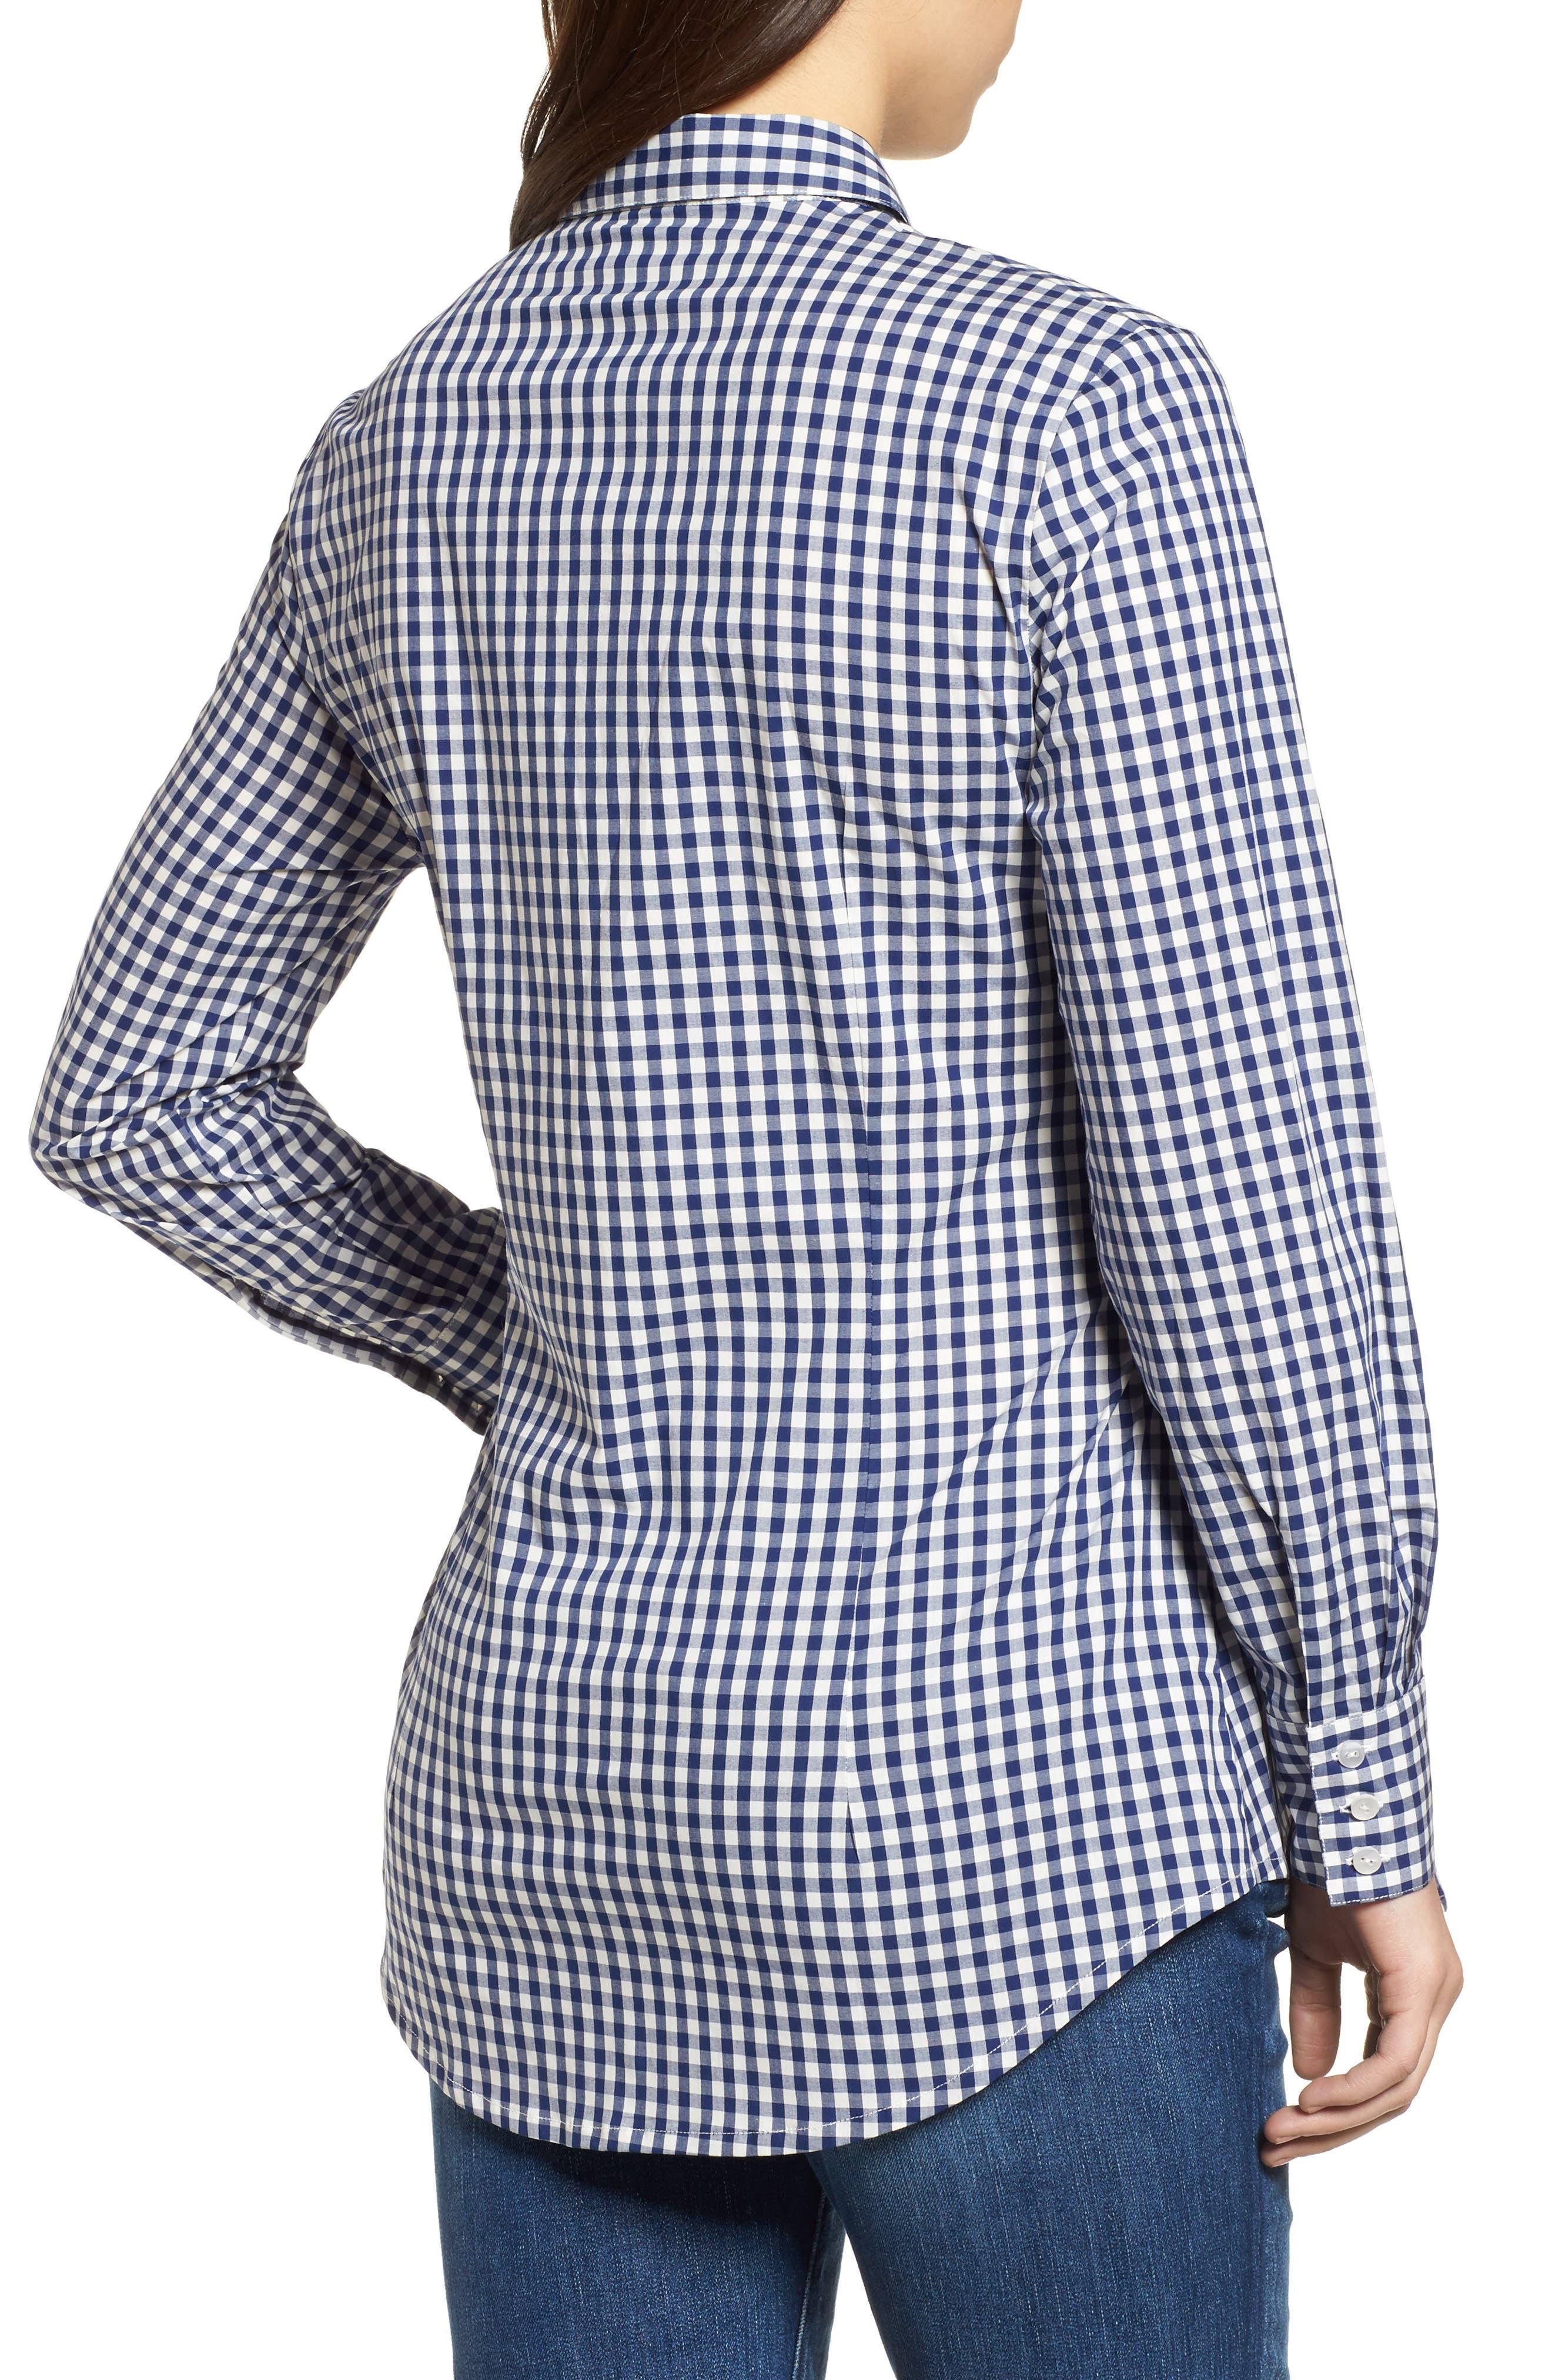 Lindsay Check Maternity Shirt,                             Alternate thumbnail 2, color,                             BLUE GINGHAM